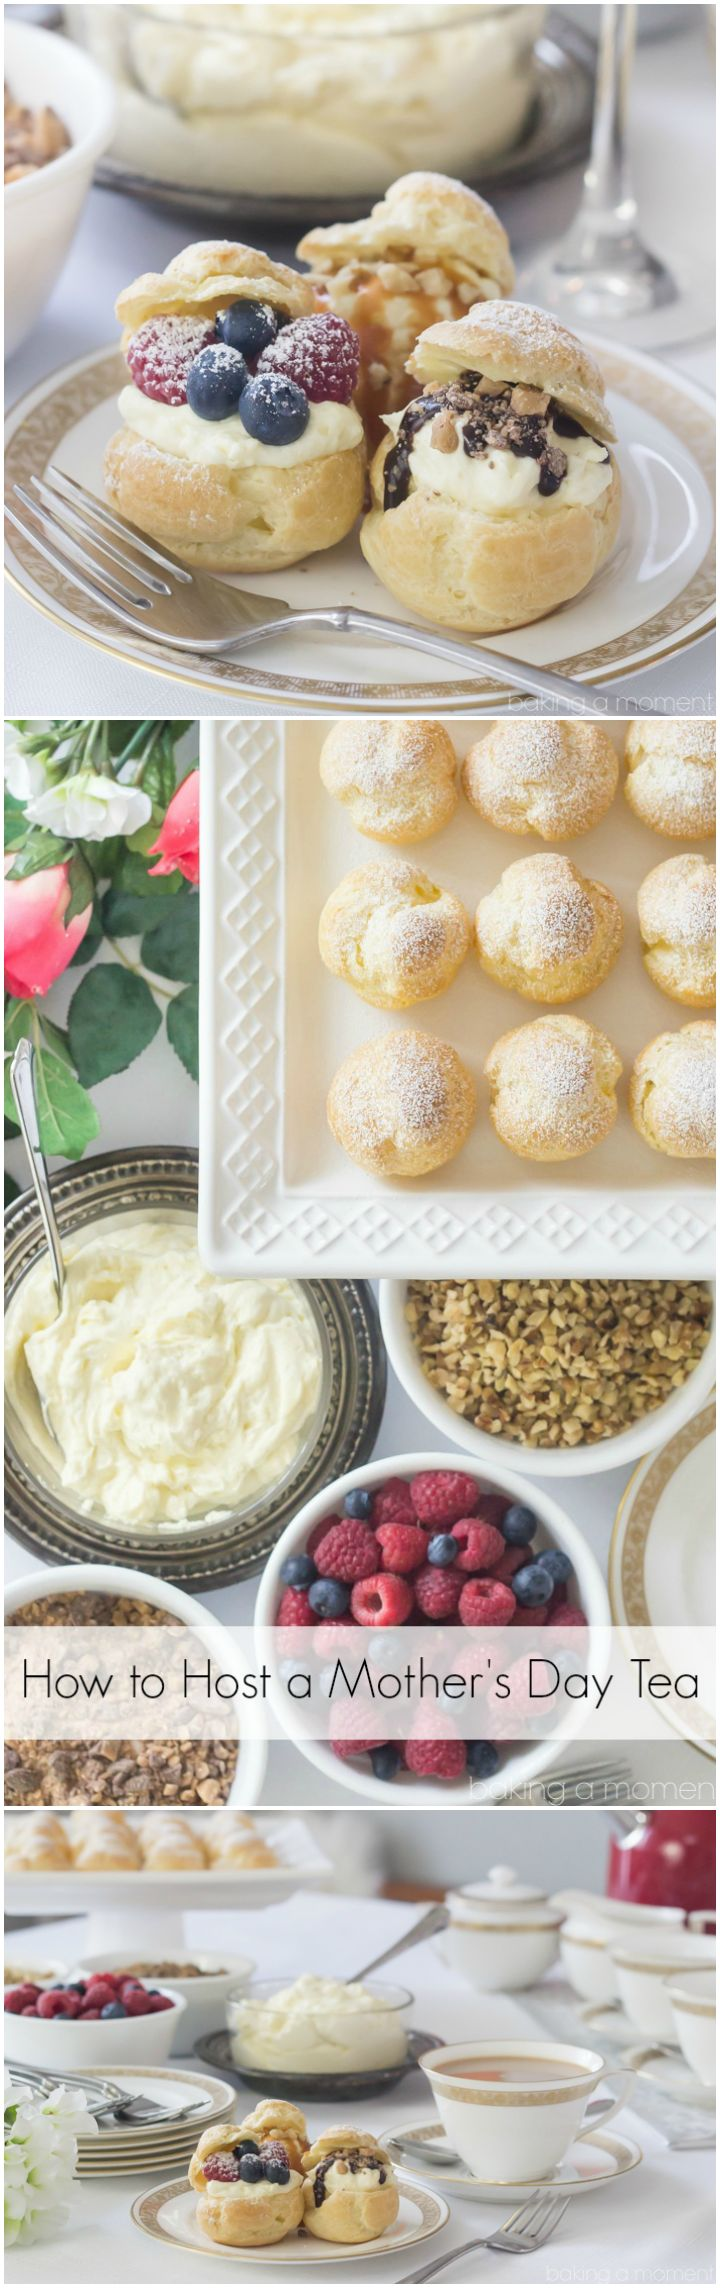 How to Host a Mother's Day Tea with a DIY Cream Puff Bar ~ http://bakingamoment.com @kitchenaidusa